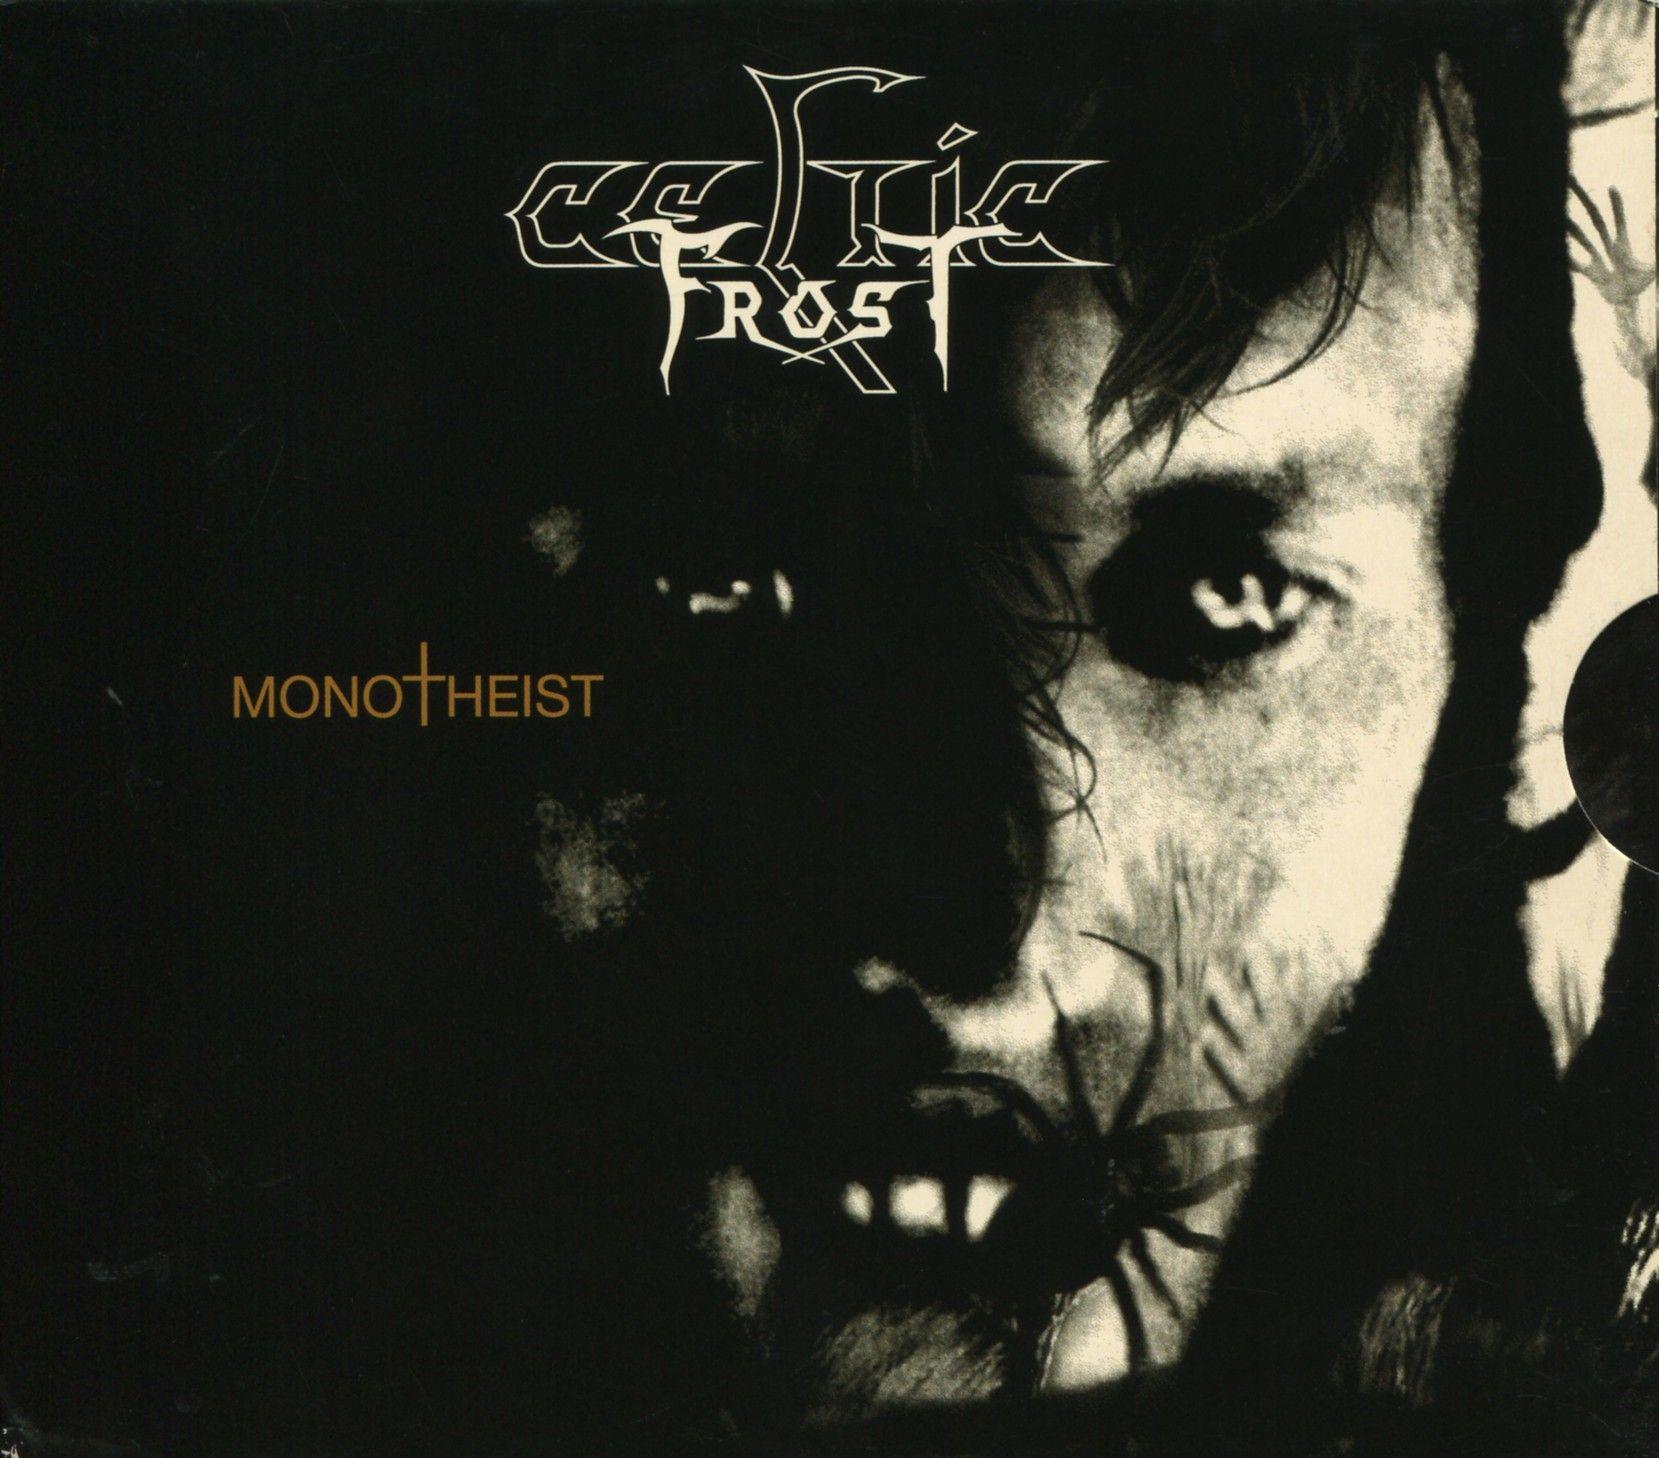 Celtic Frost - Monotheist album cover